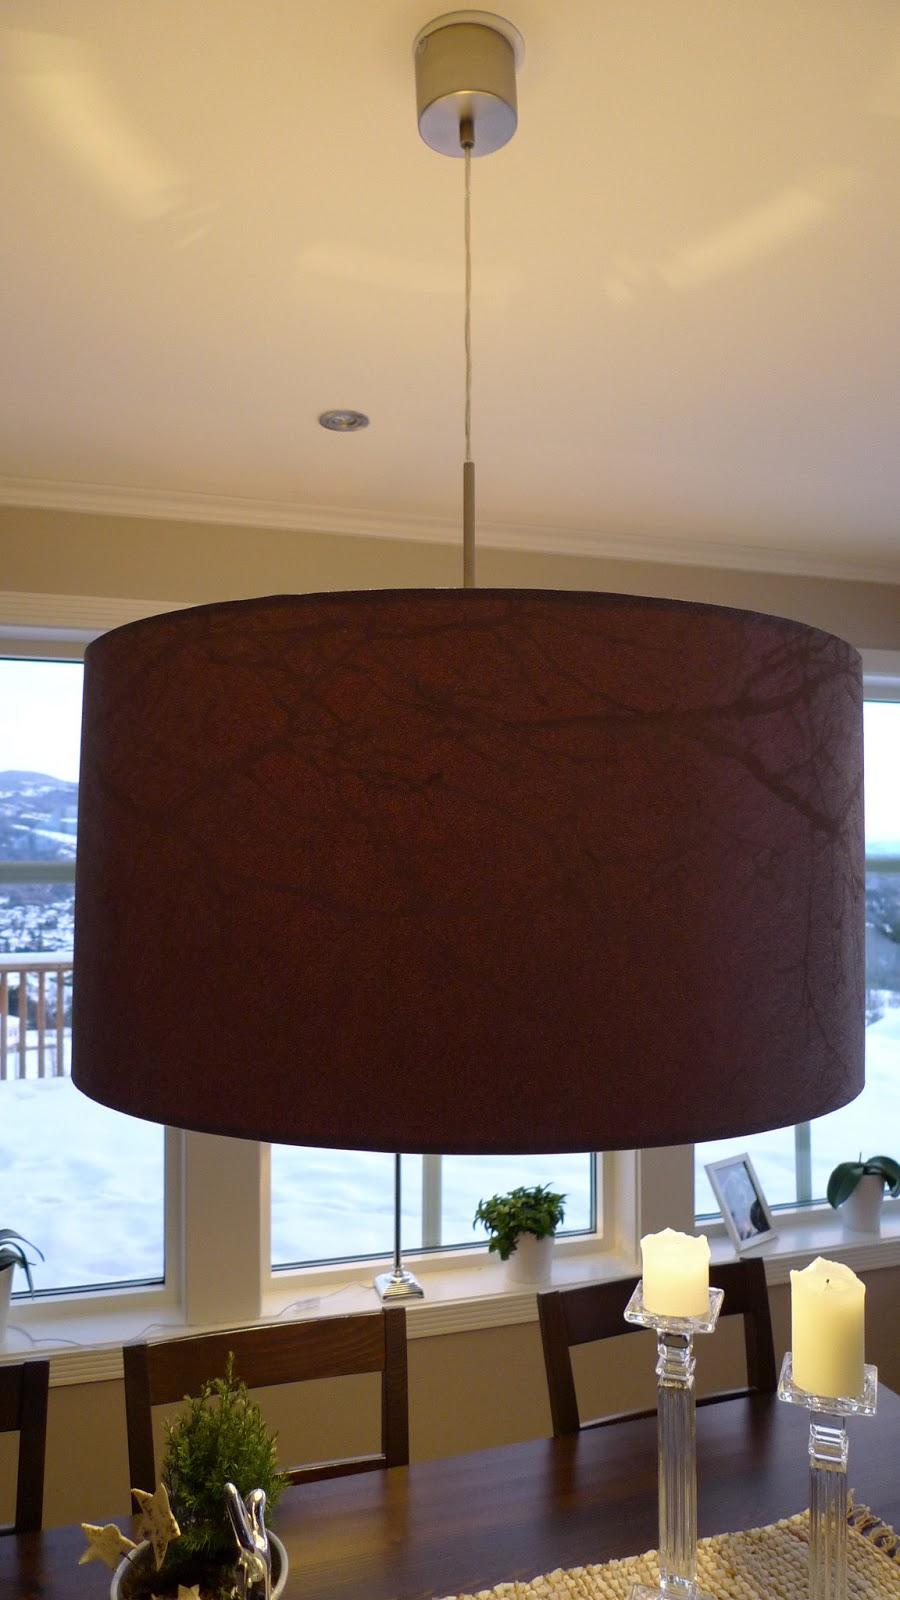 maleriet fargehandel re design av lampe fra ikea. Black Bedroom Furniture Sets. Home Design Ideas